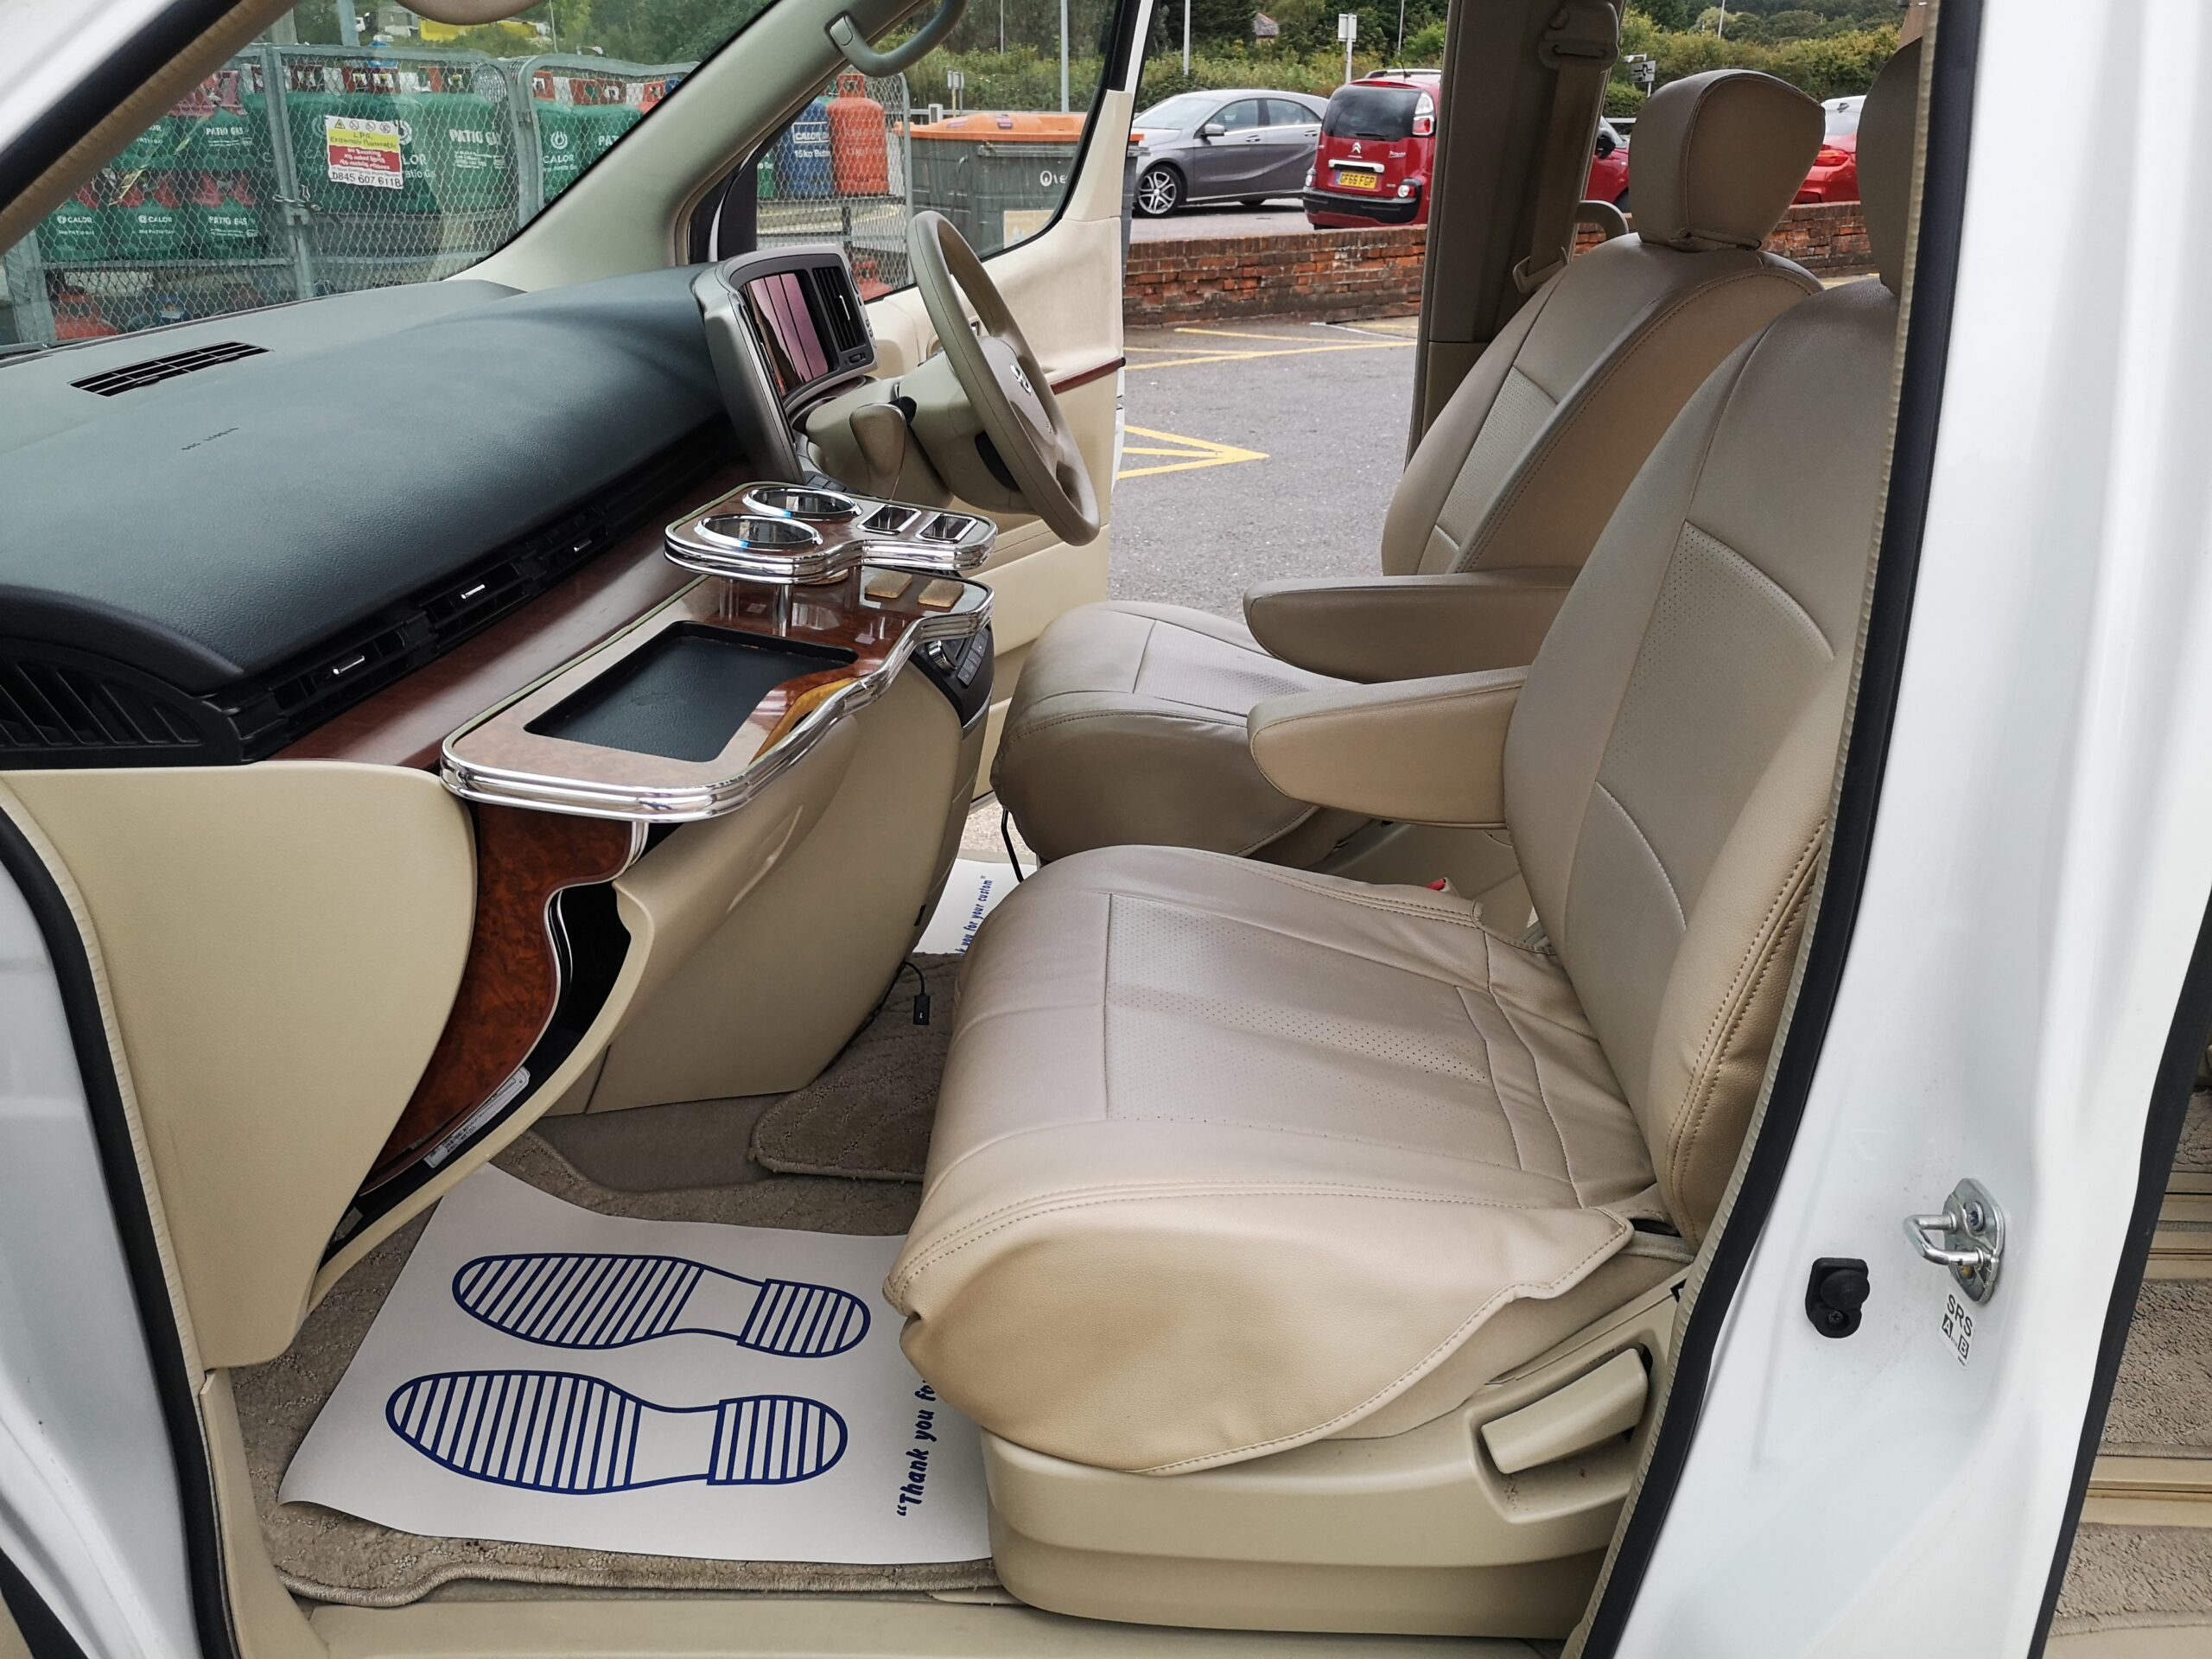 NISSAN ELGRAND VG 3.5 V6 PETROL 2005(55) BIMTA WARRANTED MILEAGE